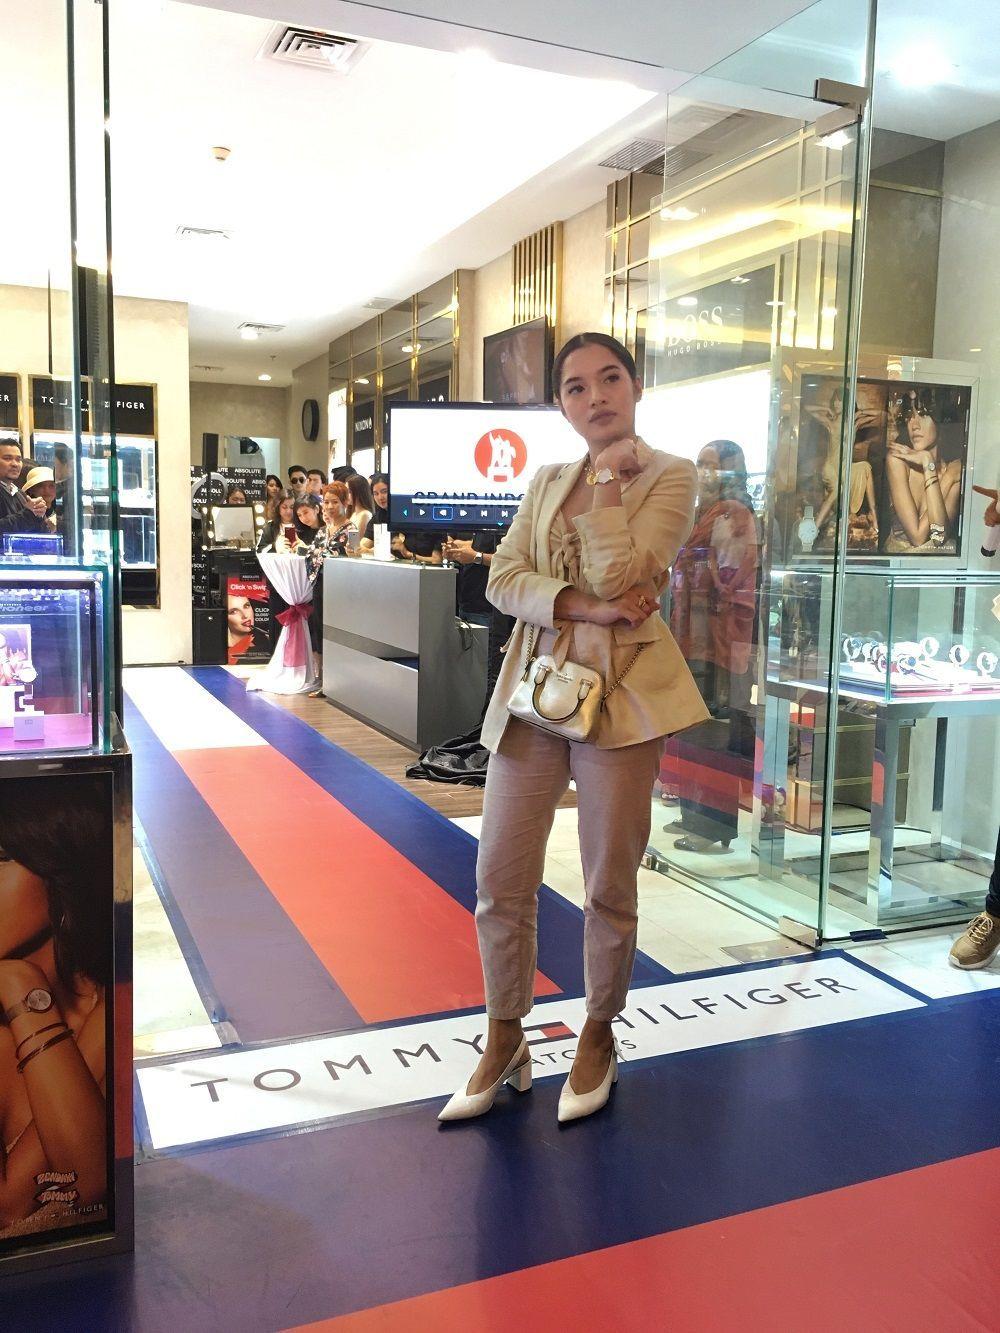 Tommy Hilfiger x Zendaya Rilis Arloji Berdesain Elegan nan Millennial